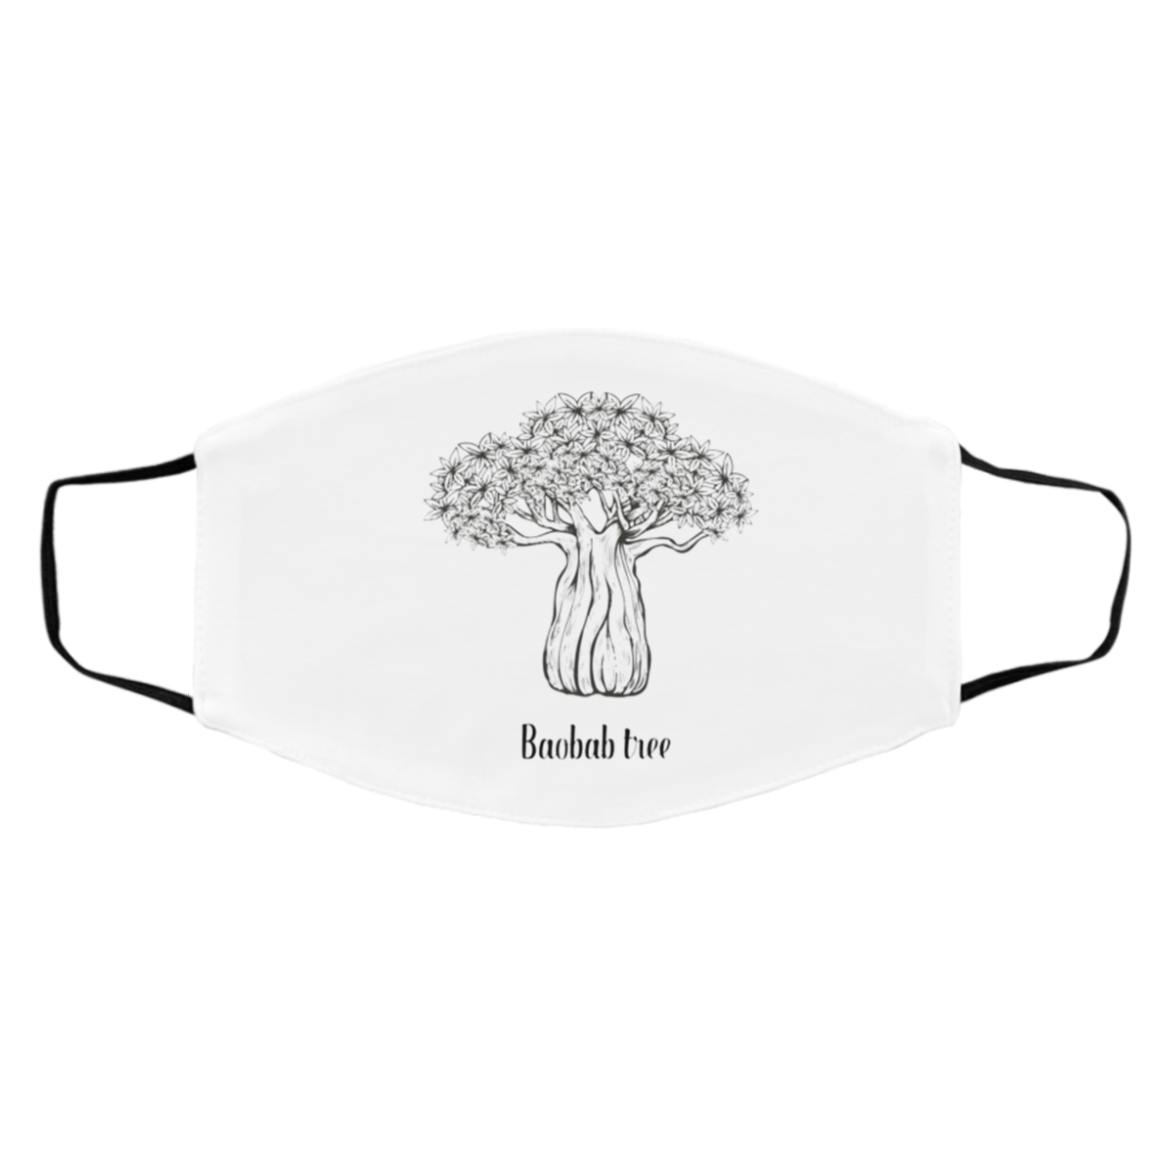 B-AOBAB- Basic Face Masks Cover US 2020